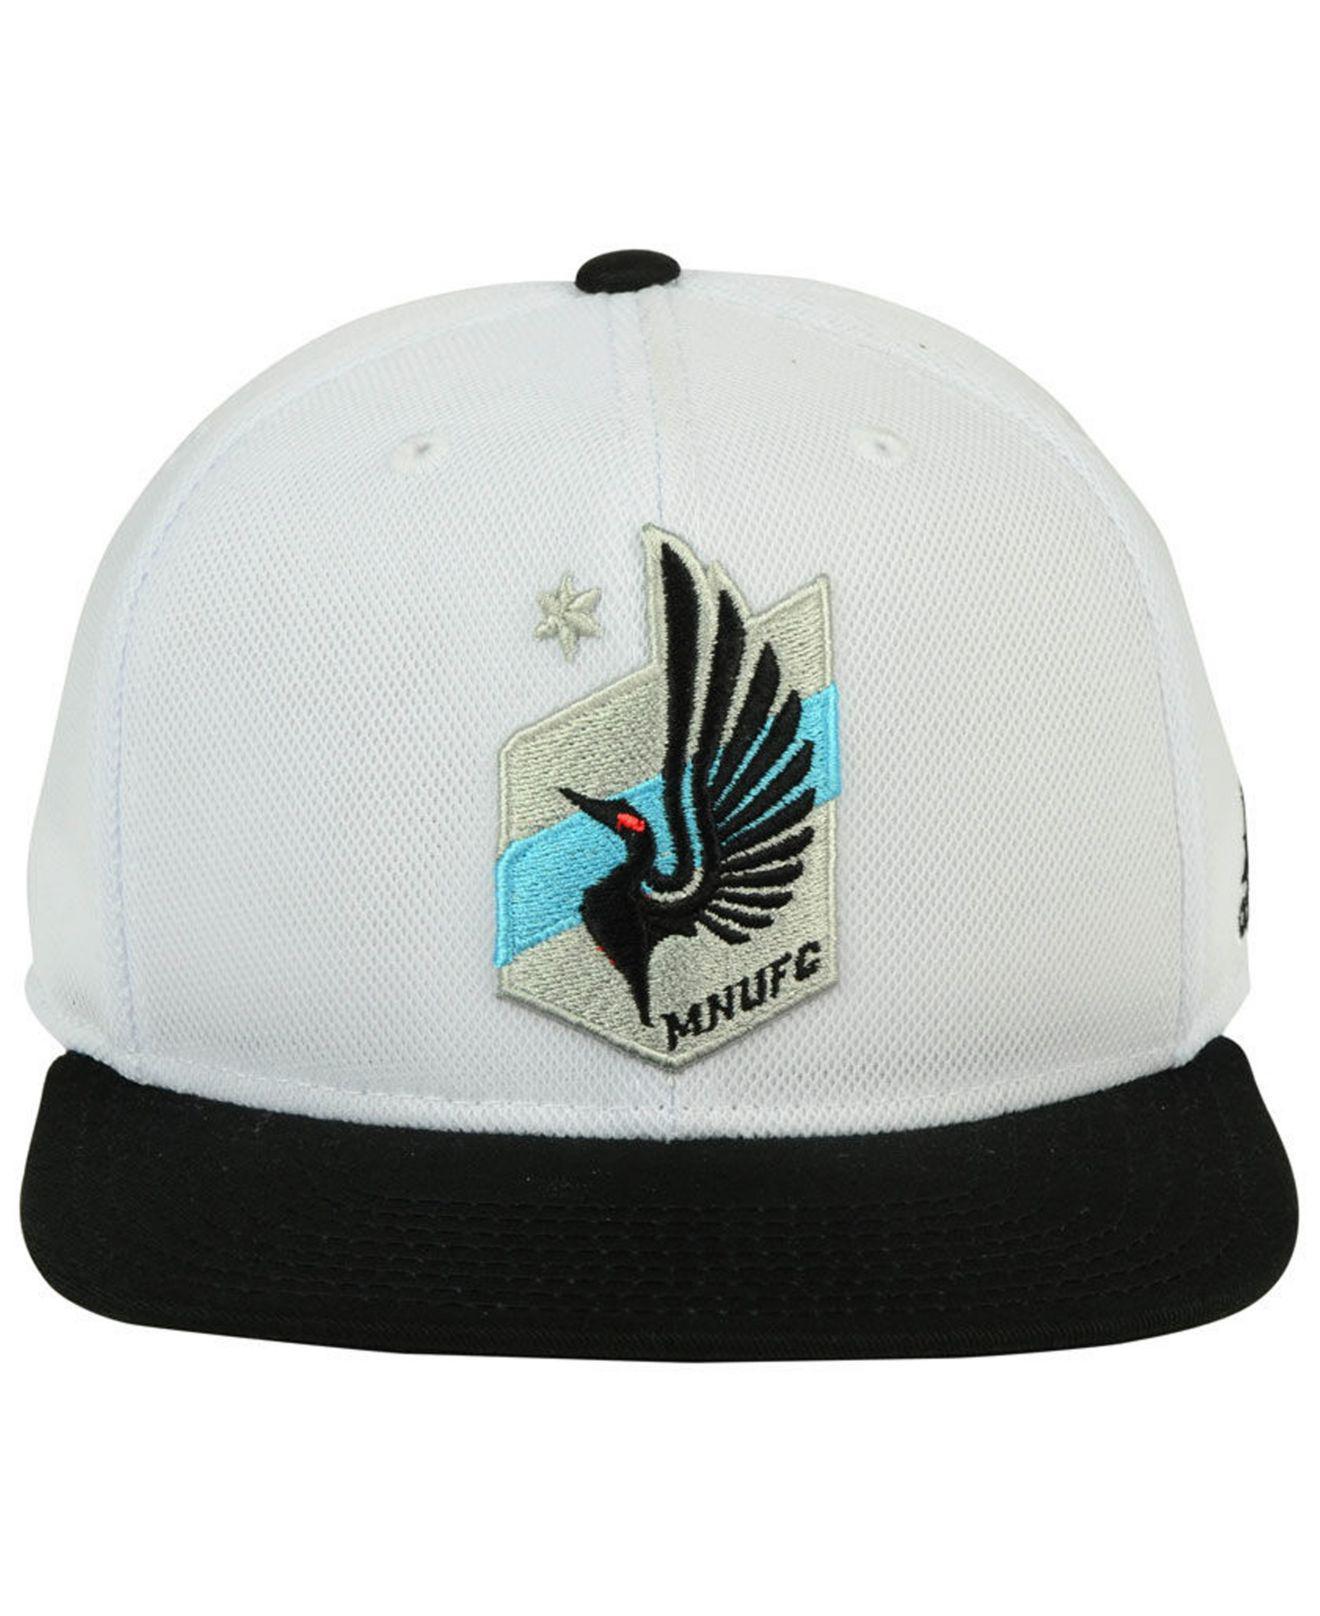 the best attitude 6eceb 02c77 ... buy lyst adidas minnesota united fc 2tone snapback cap for men 79c29  ac21f